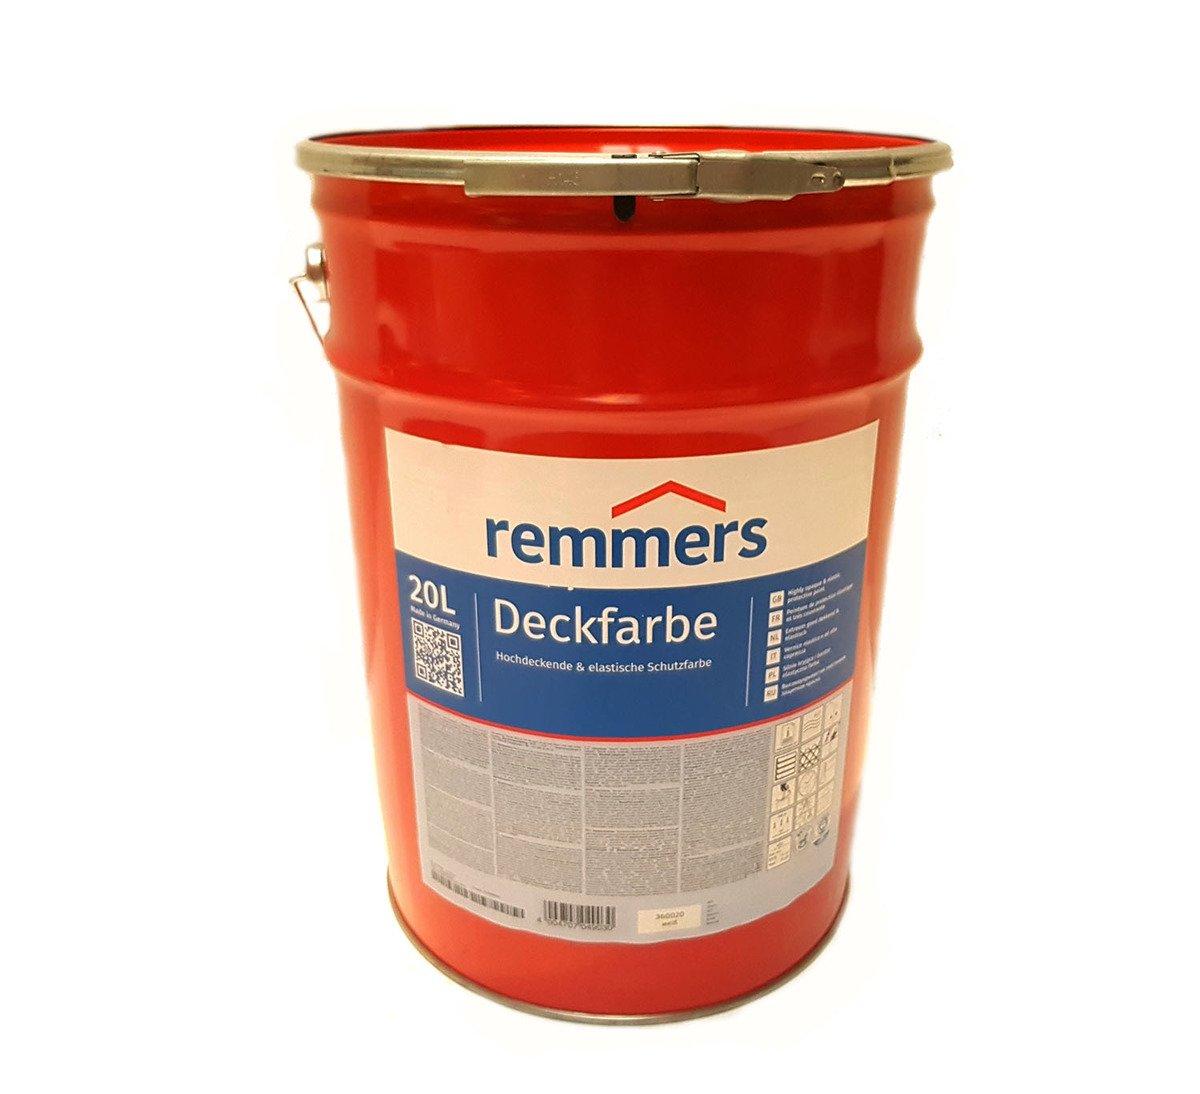 remmers aidol deckfarbe 20 l wetterschutzfarbe wei baustoffe remmers lacke lasuren f r. Black Bedroom Furniture Sets. Home Design Ideas